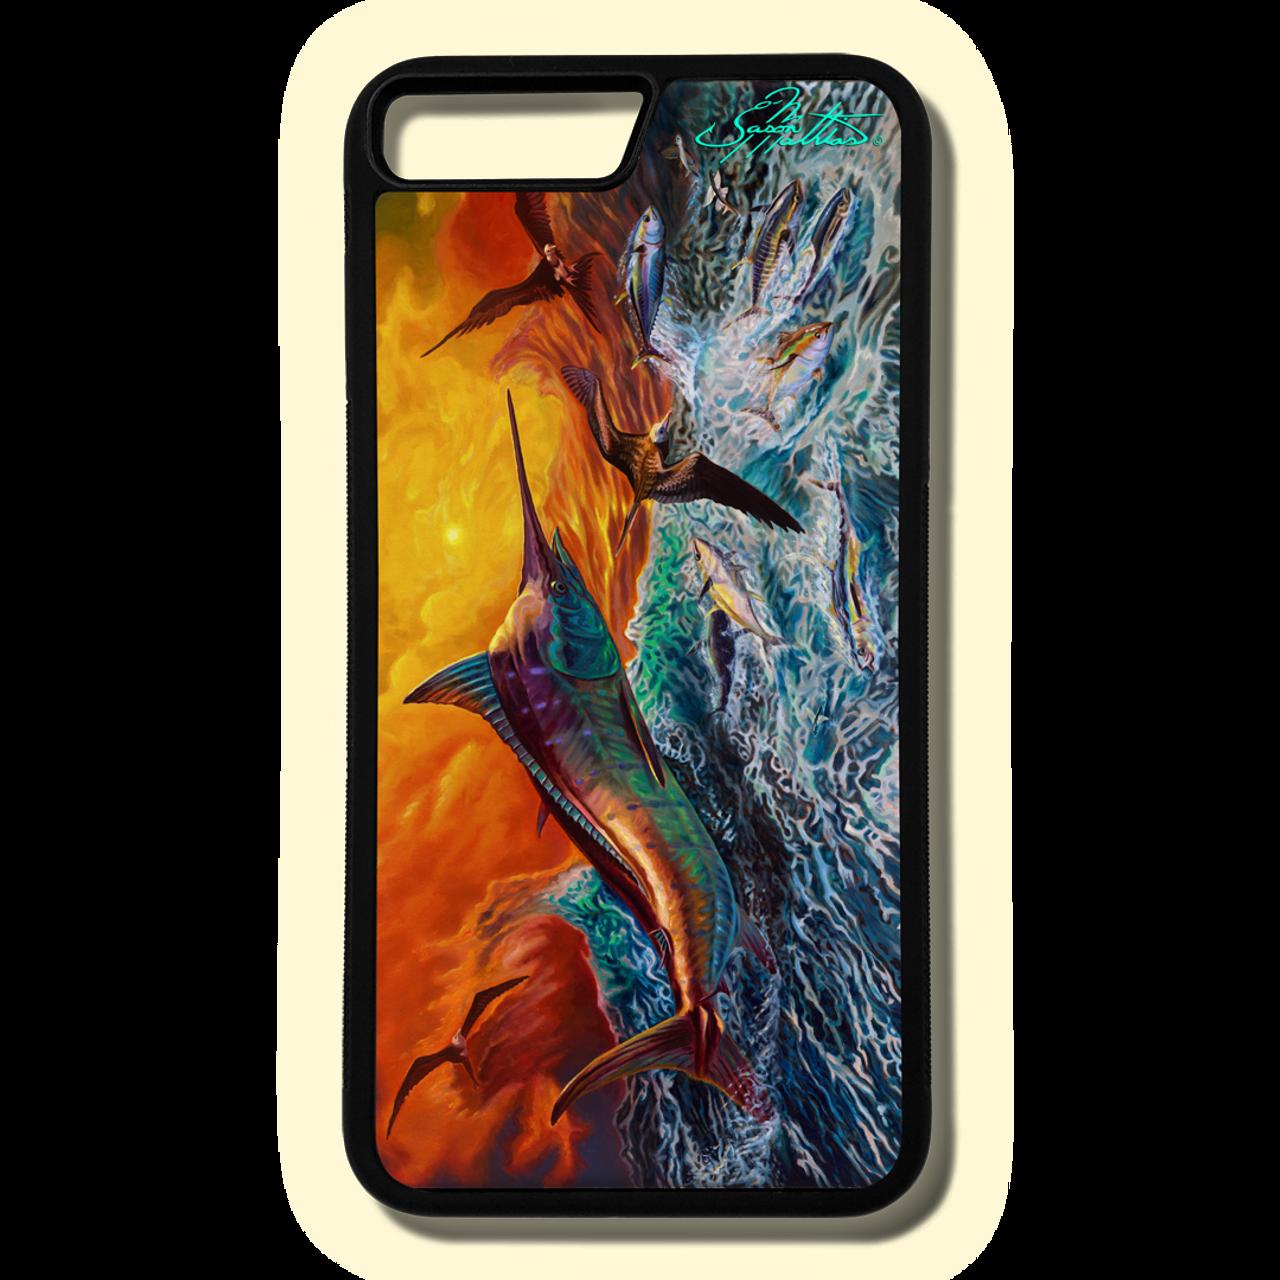 iphone 8 art phone case